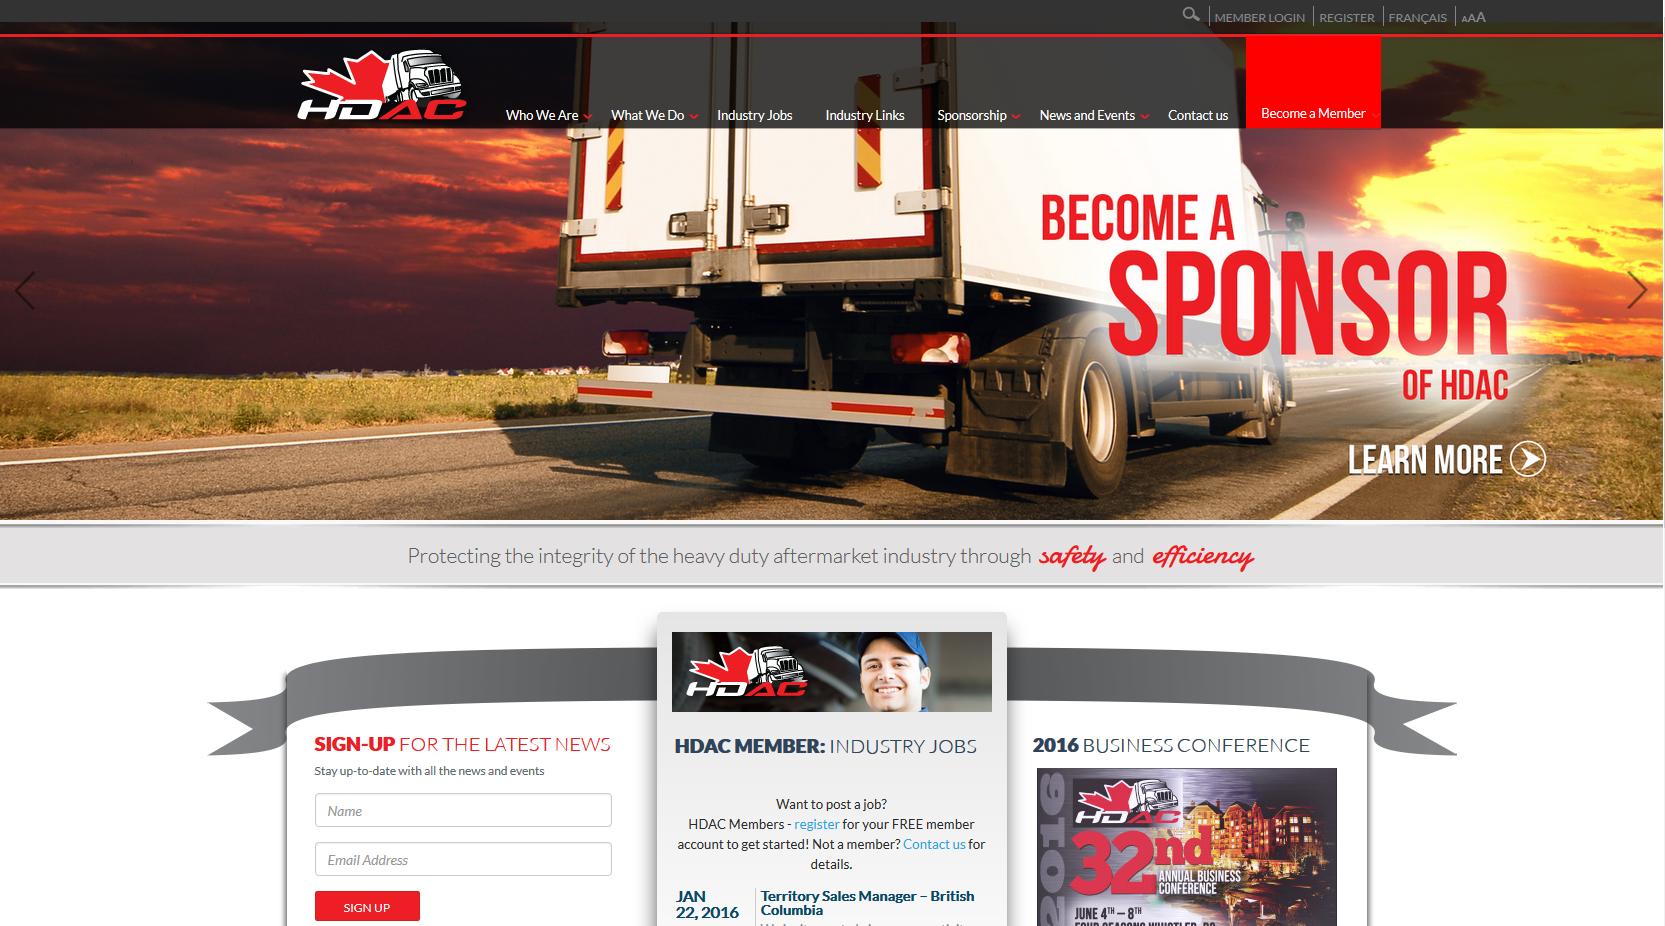 Heavy Duty Aftermarket Canada (HDAC)